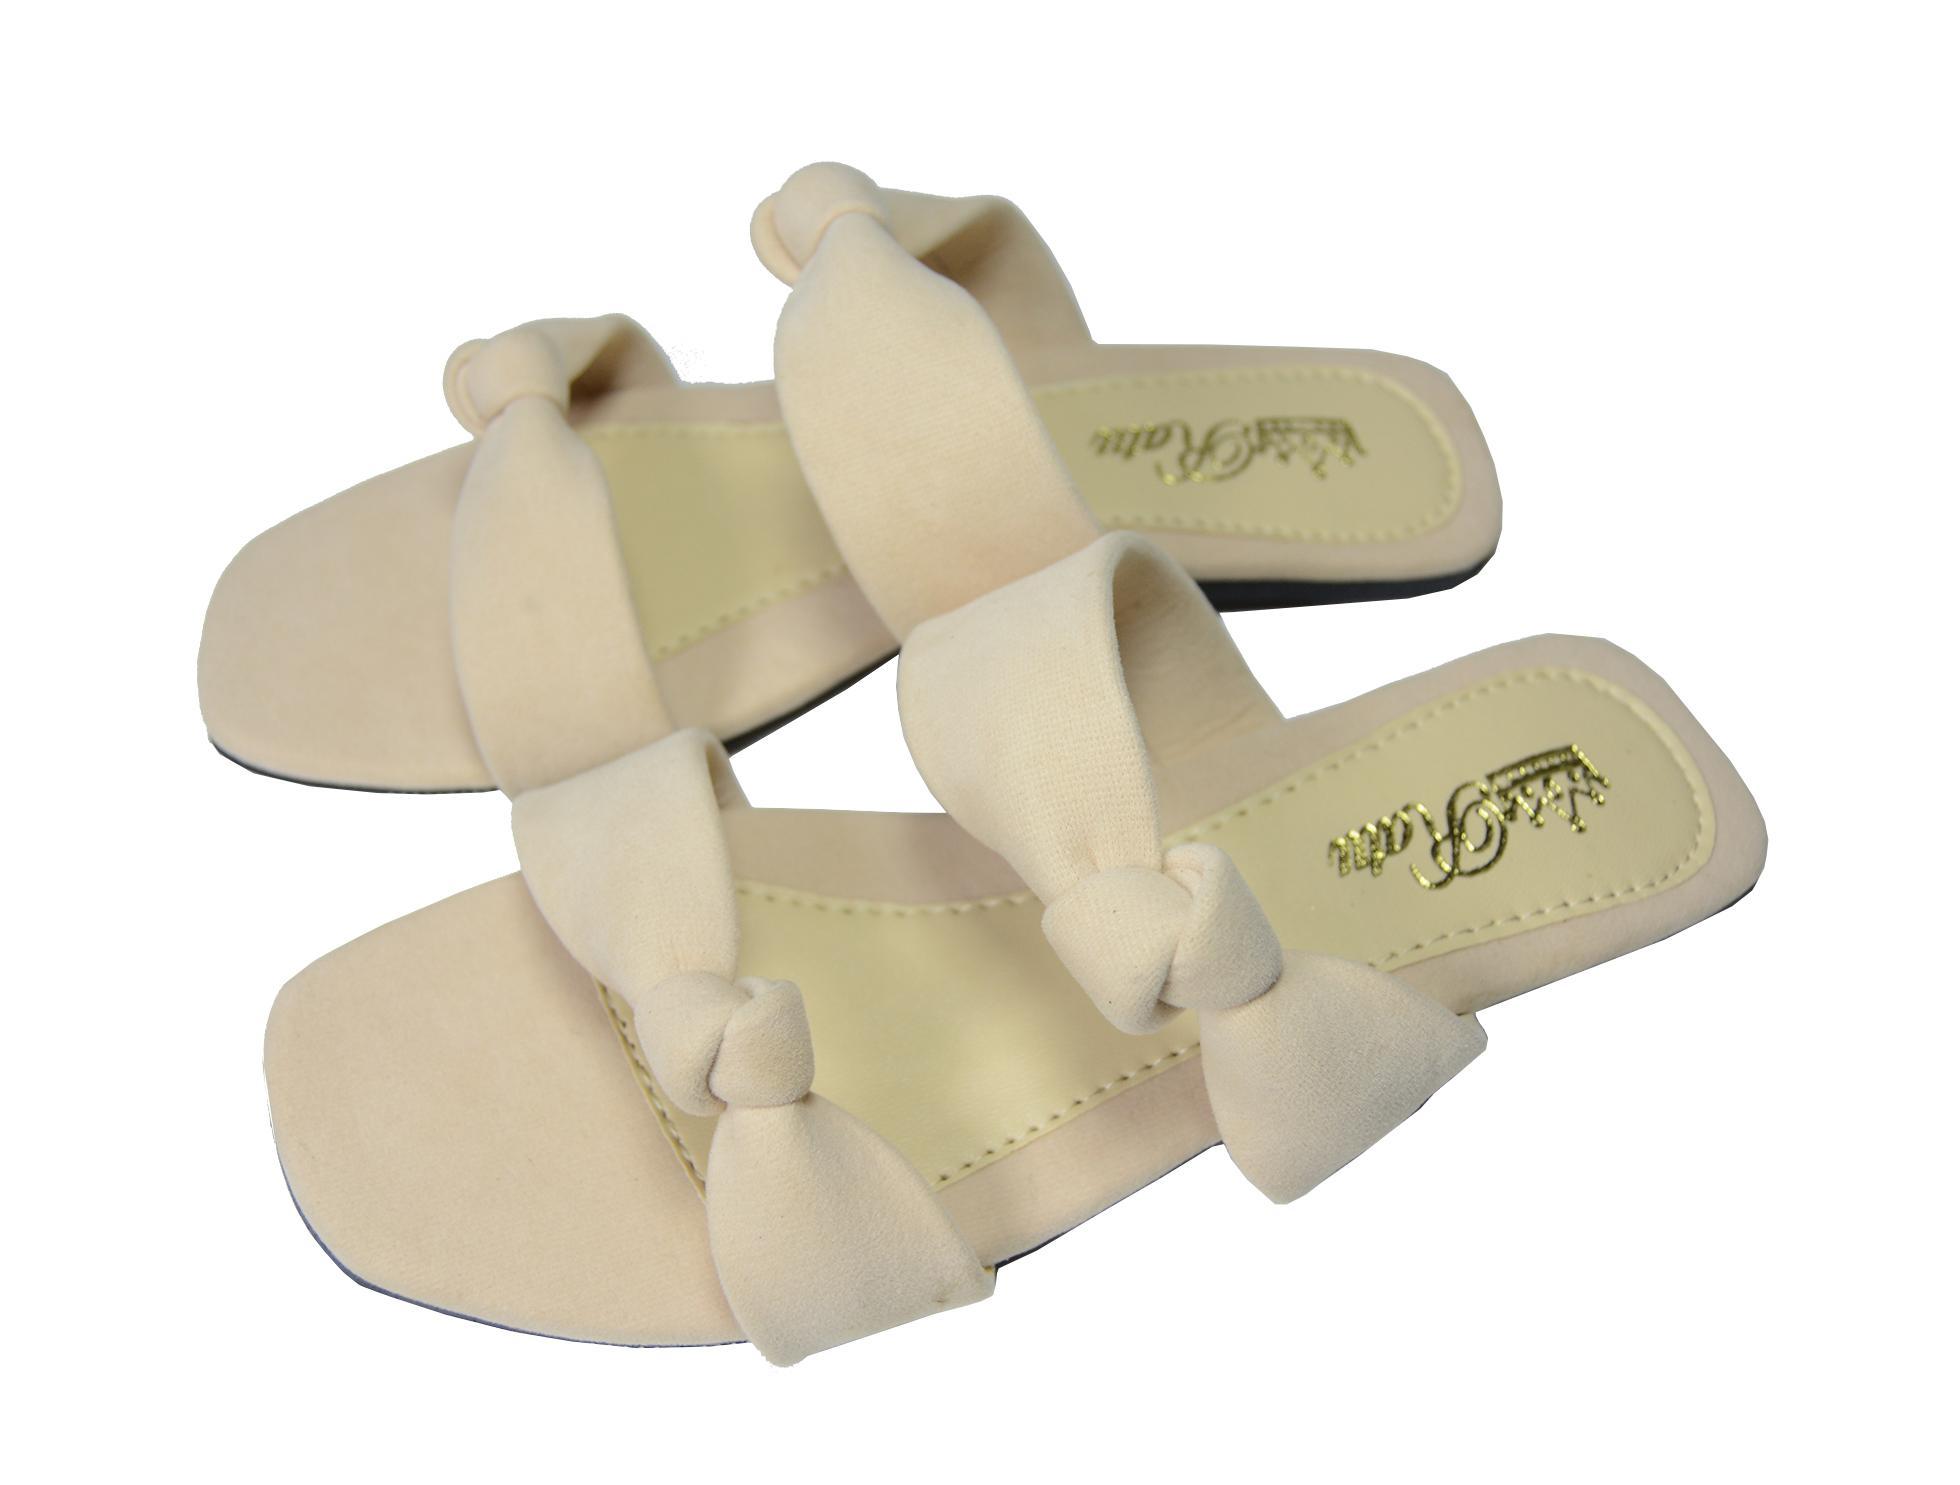 Sepatu Merk Buccheri Info Harga Sandal Wanita Flatbed Formal Rc 04 Flat Flip Flop Tali Sampul Ad09